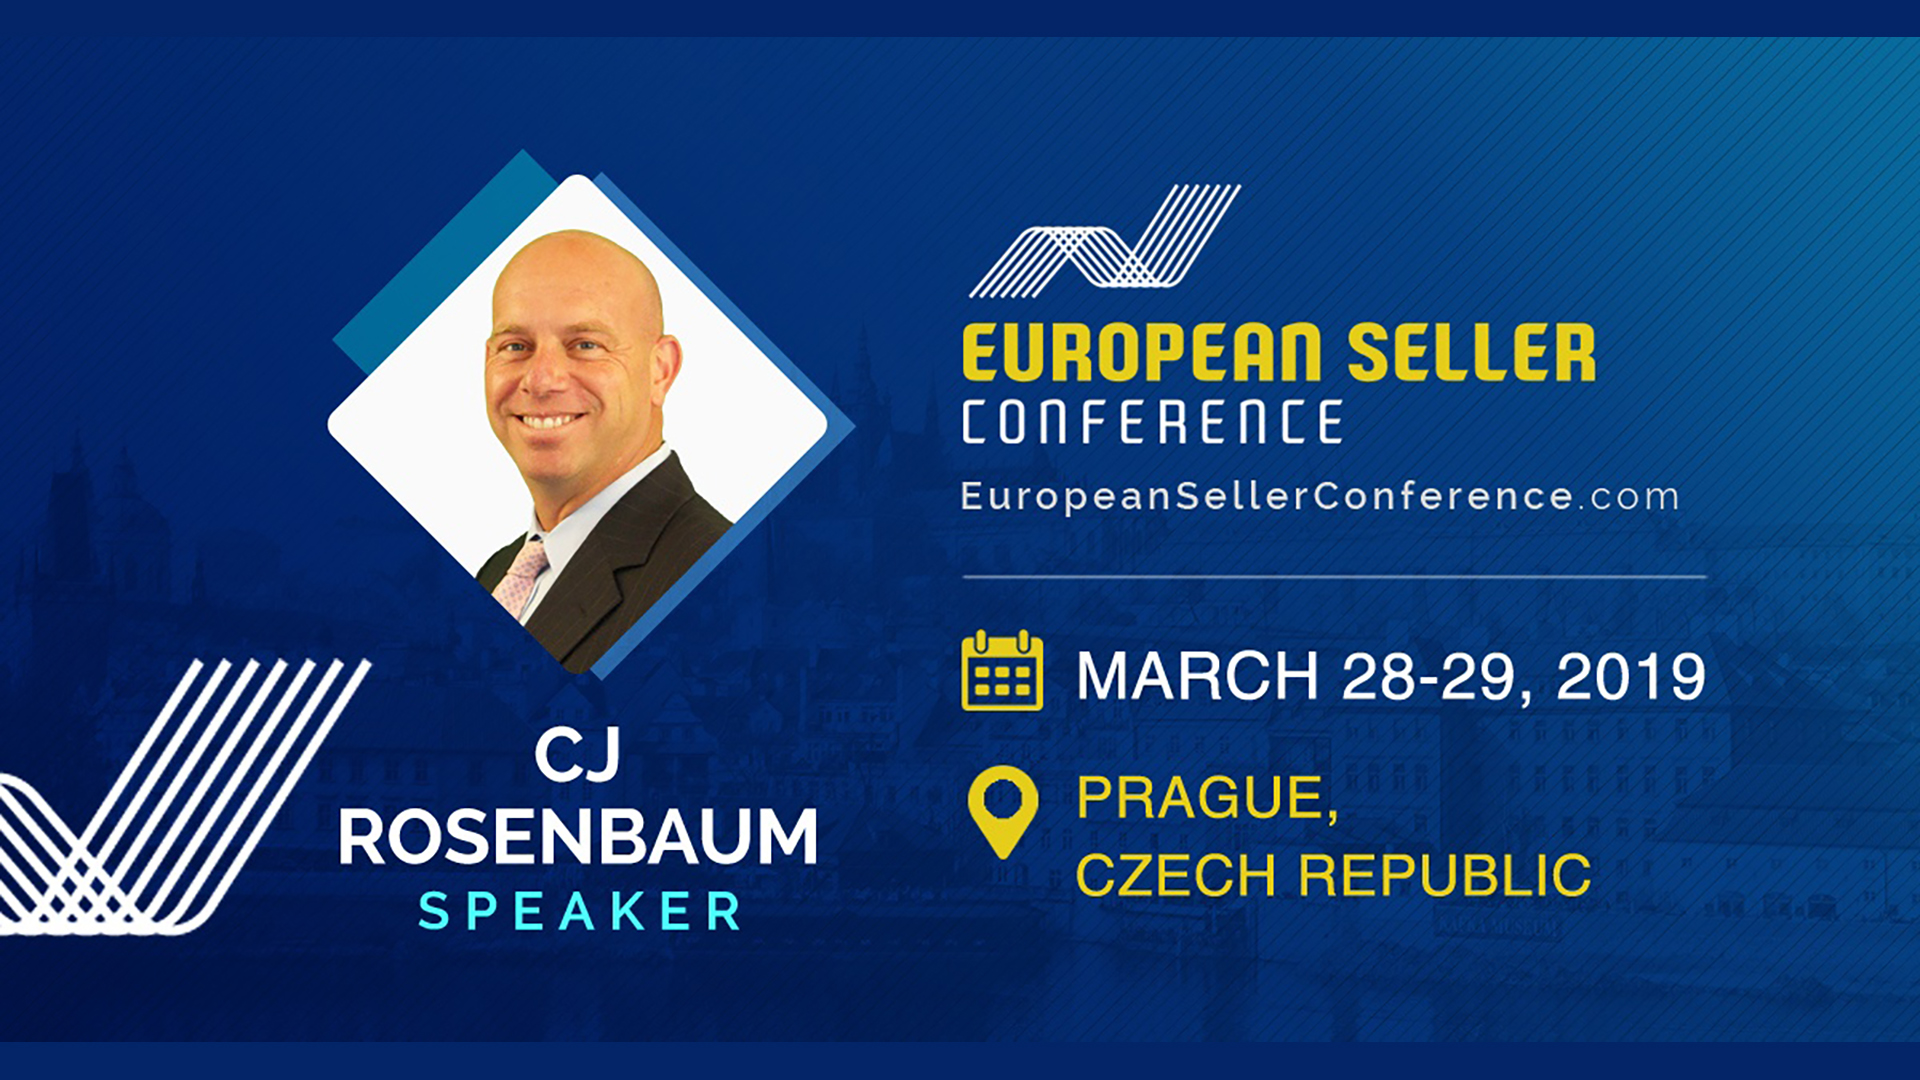 European Seller Conference 2019